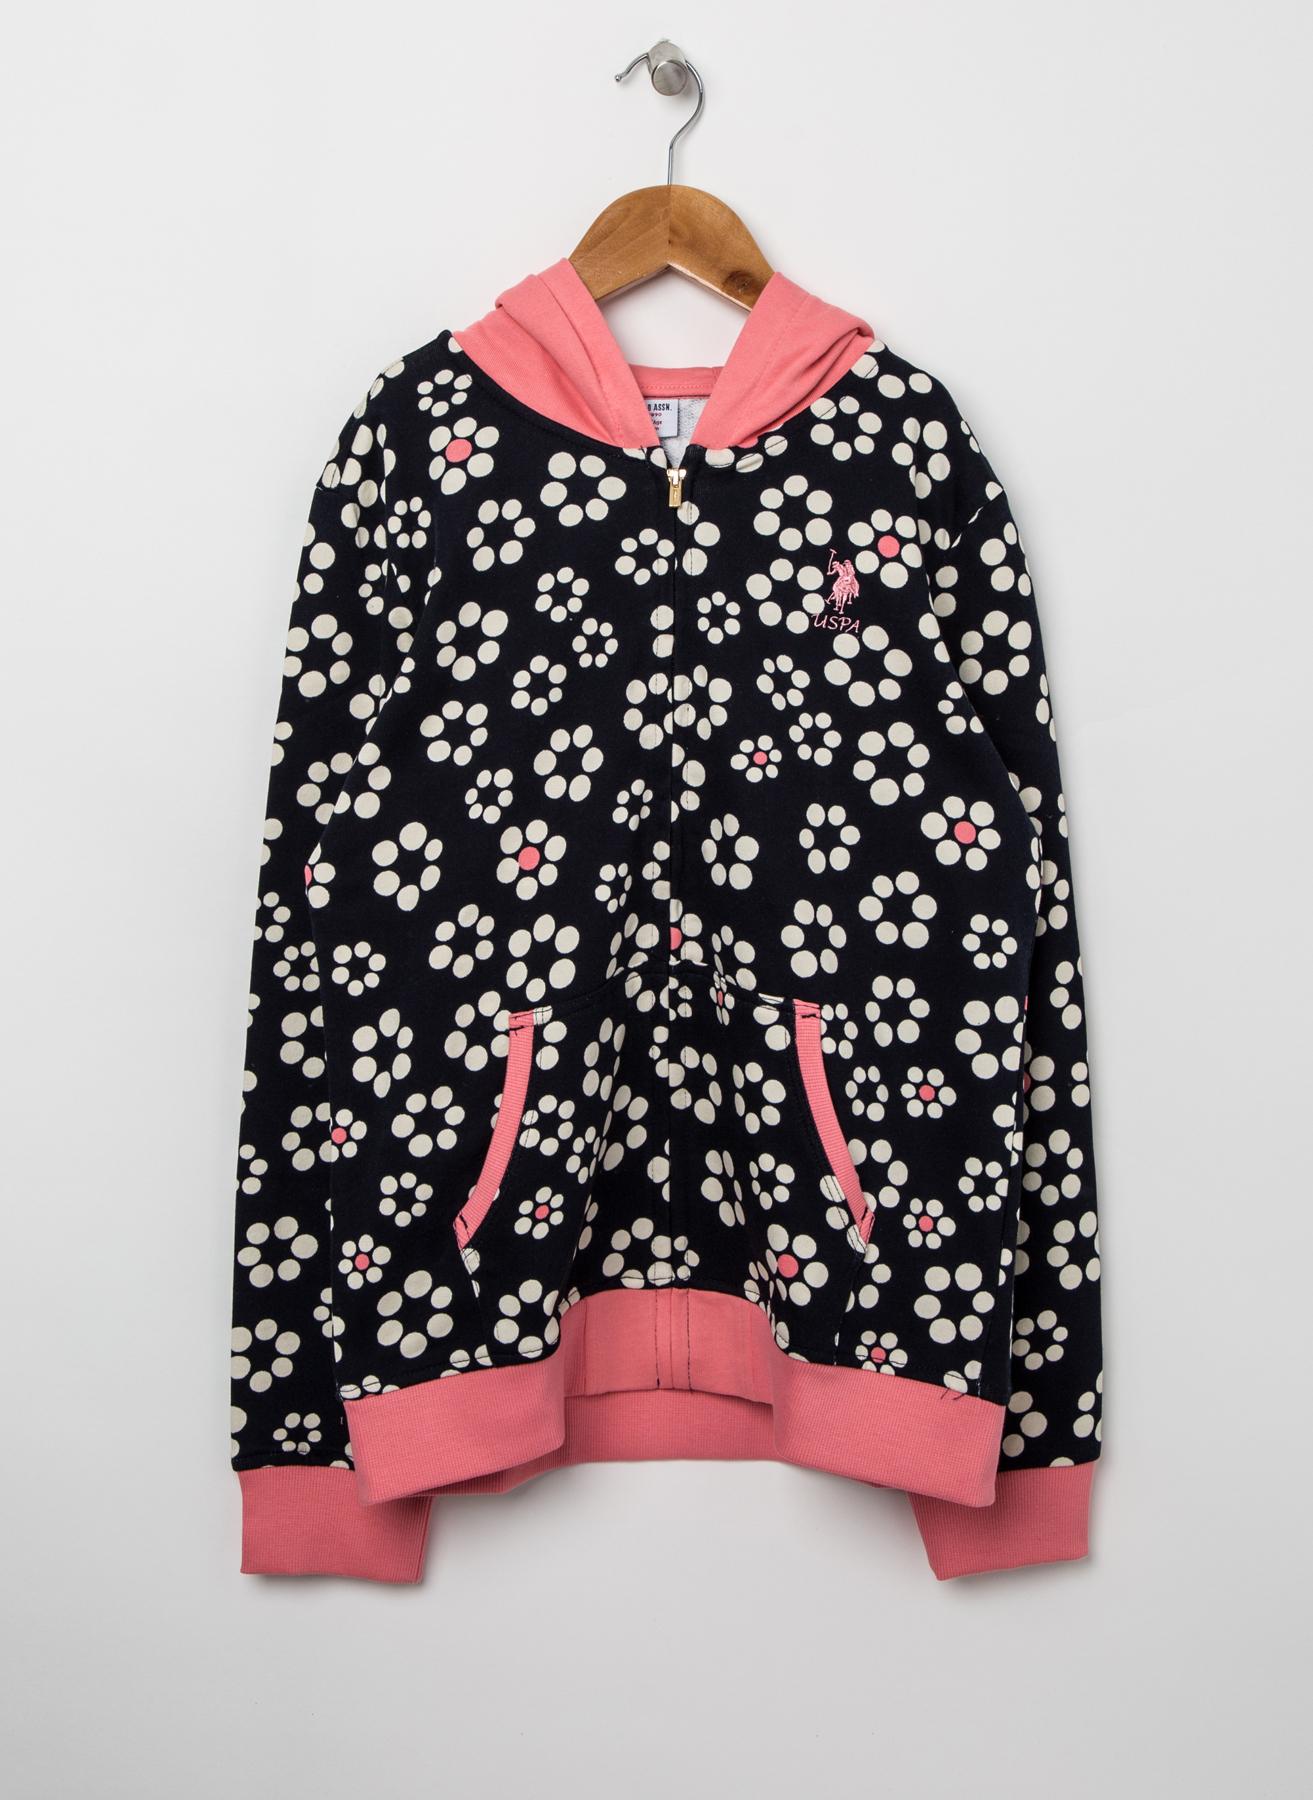 U.S. Polo Assn. Kapüşonlu Sweatshirt 8 Yaş 5001704849010 Ürün Resmi